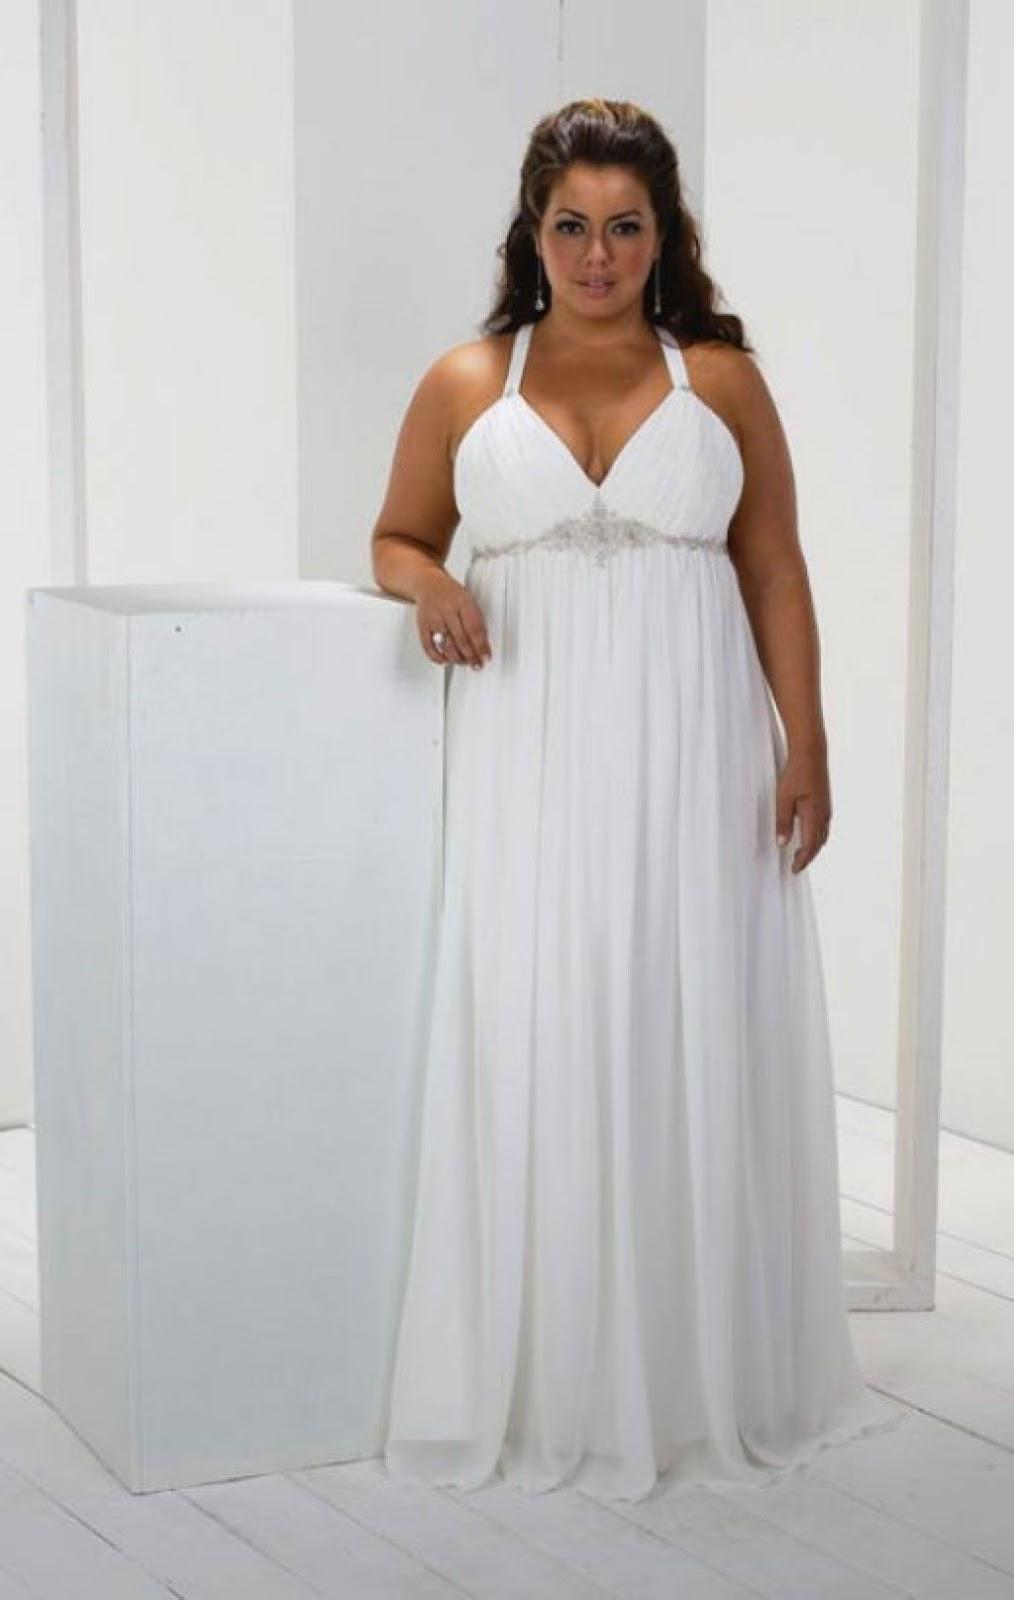 100 inexpensive size party dresses black lace size plus size beach wedding dresses 2015 ombrellifo Images